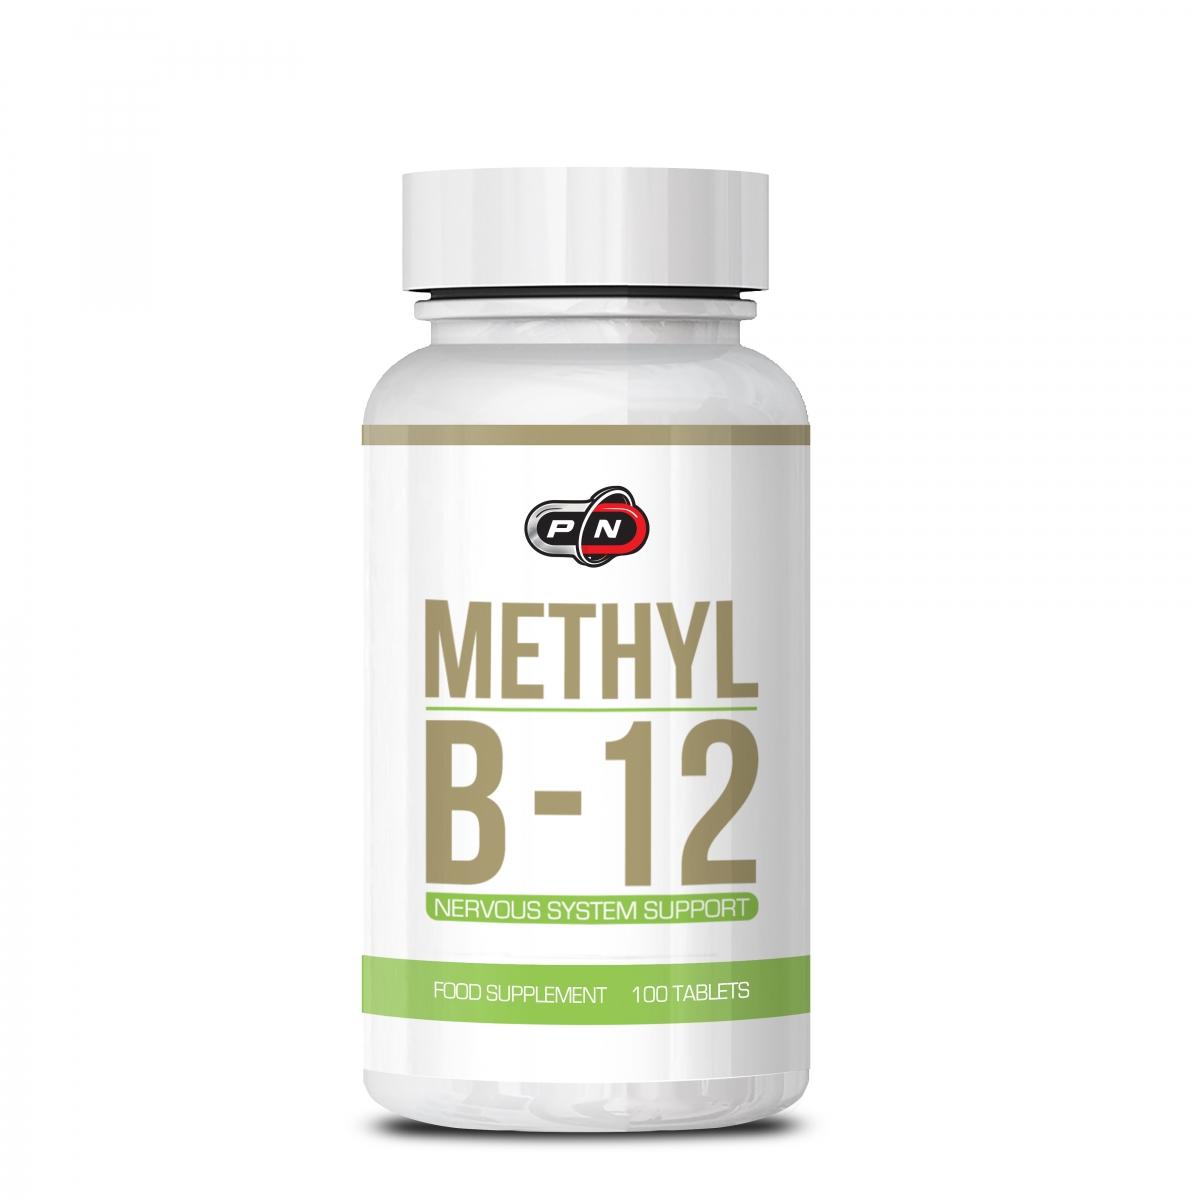 Pure Nutrition Methyl B-12 2000mcg 100tabs